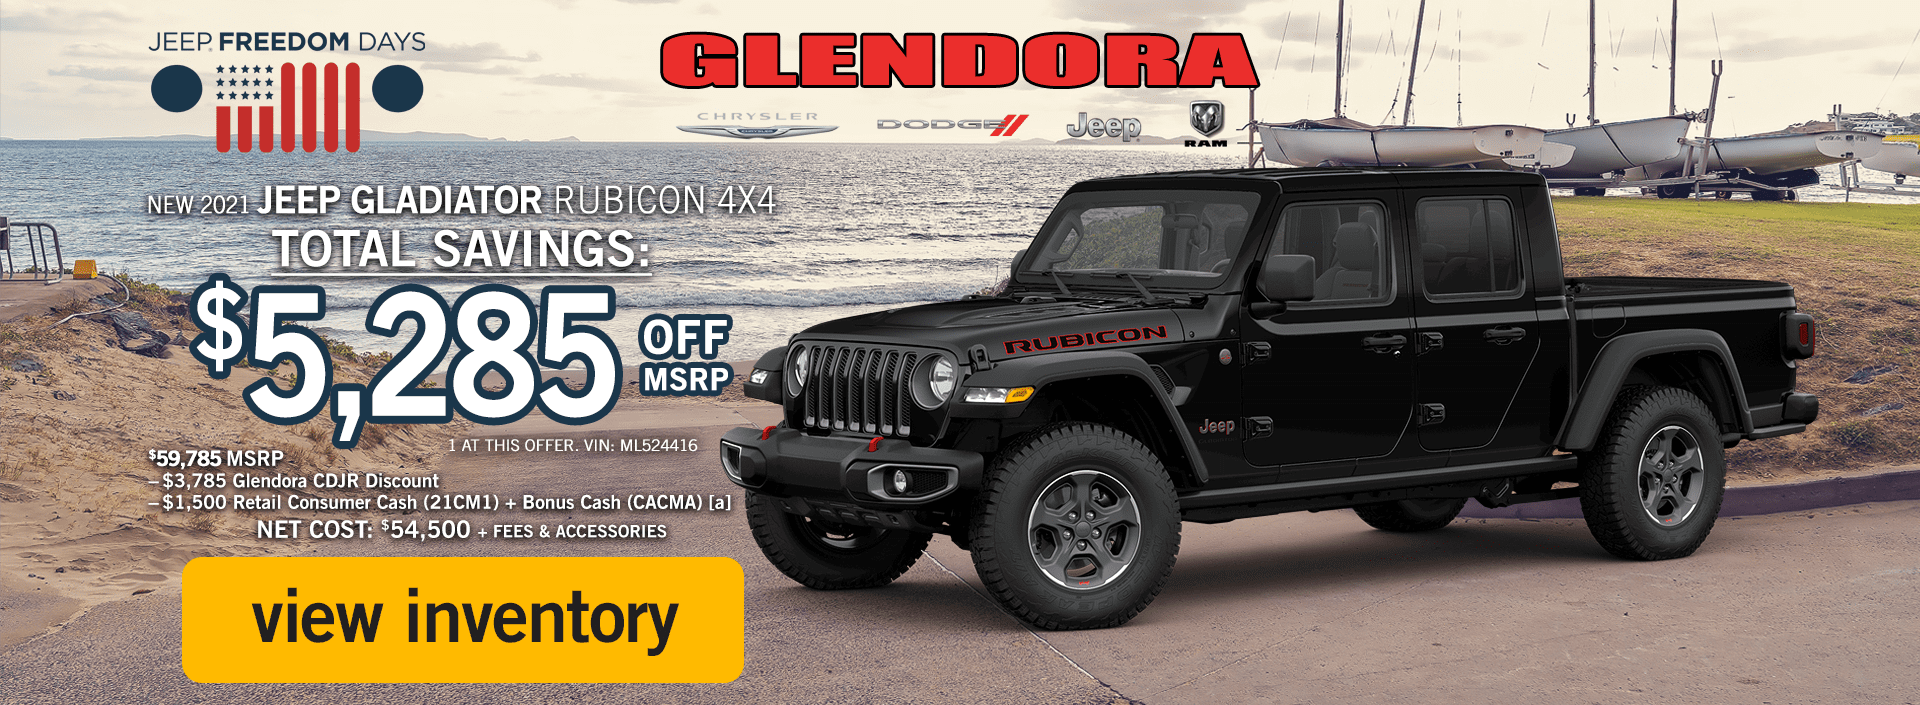 Glendora_CDJR_2021_June_Jeep_Freedom_Sales_Event_Jeep_Gladiator